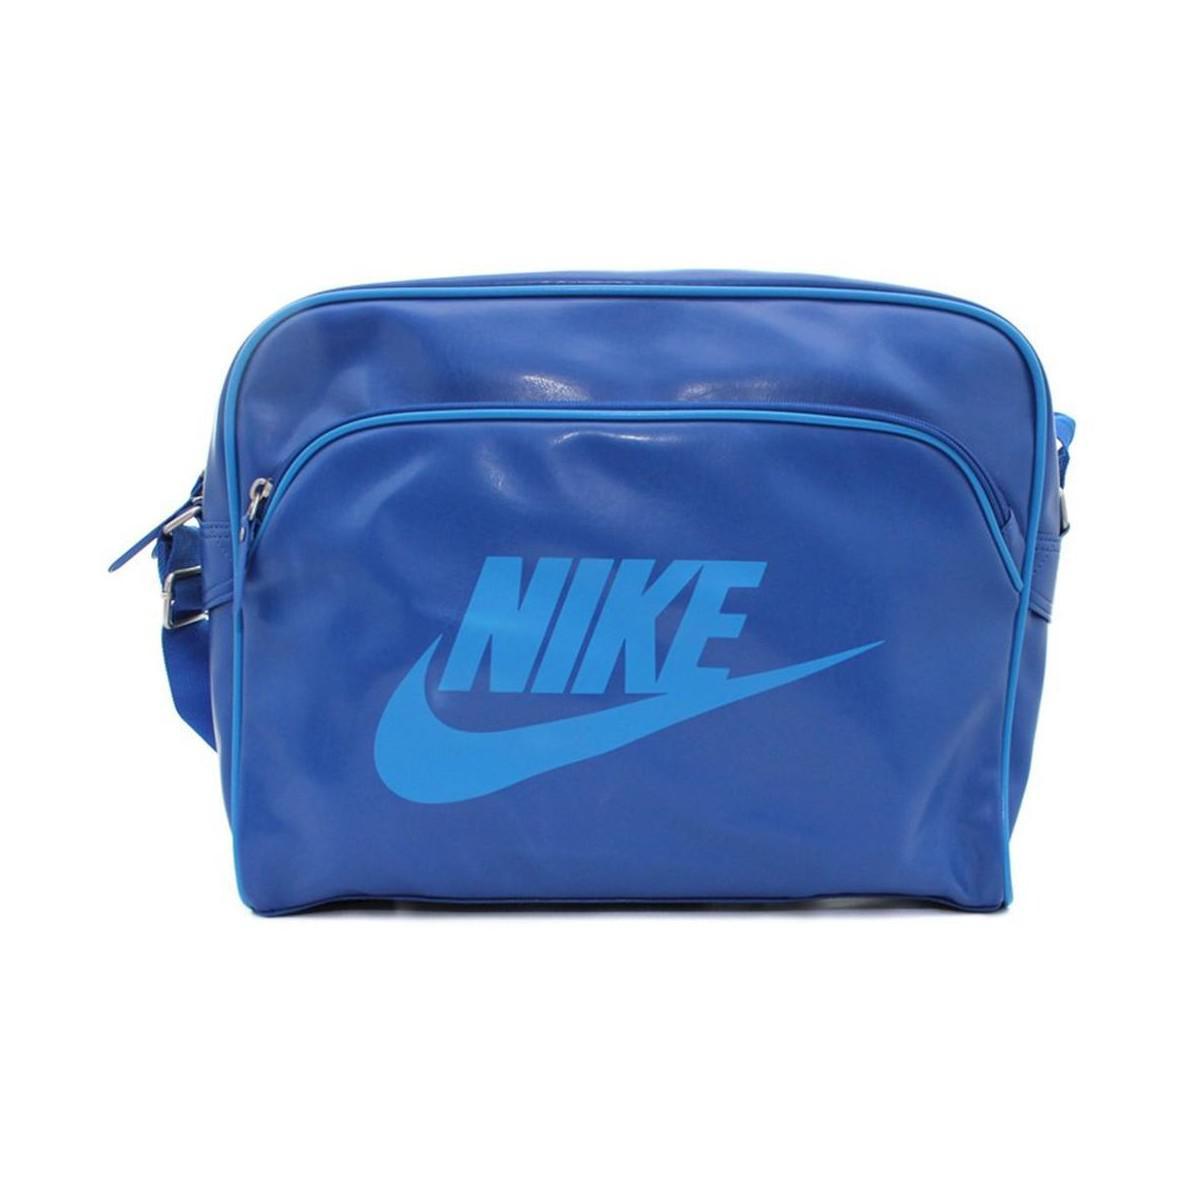 dee929153faa Nike Heritage Si Track Men s Messenger Bag In Blue in Blue for Men ...